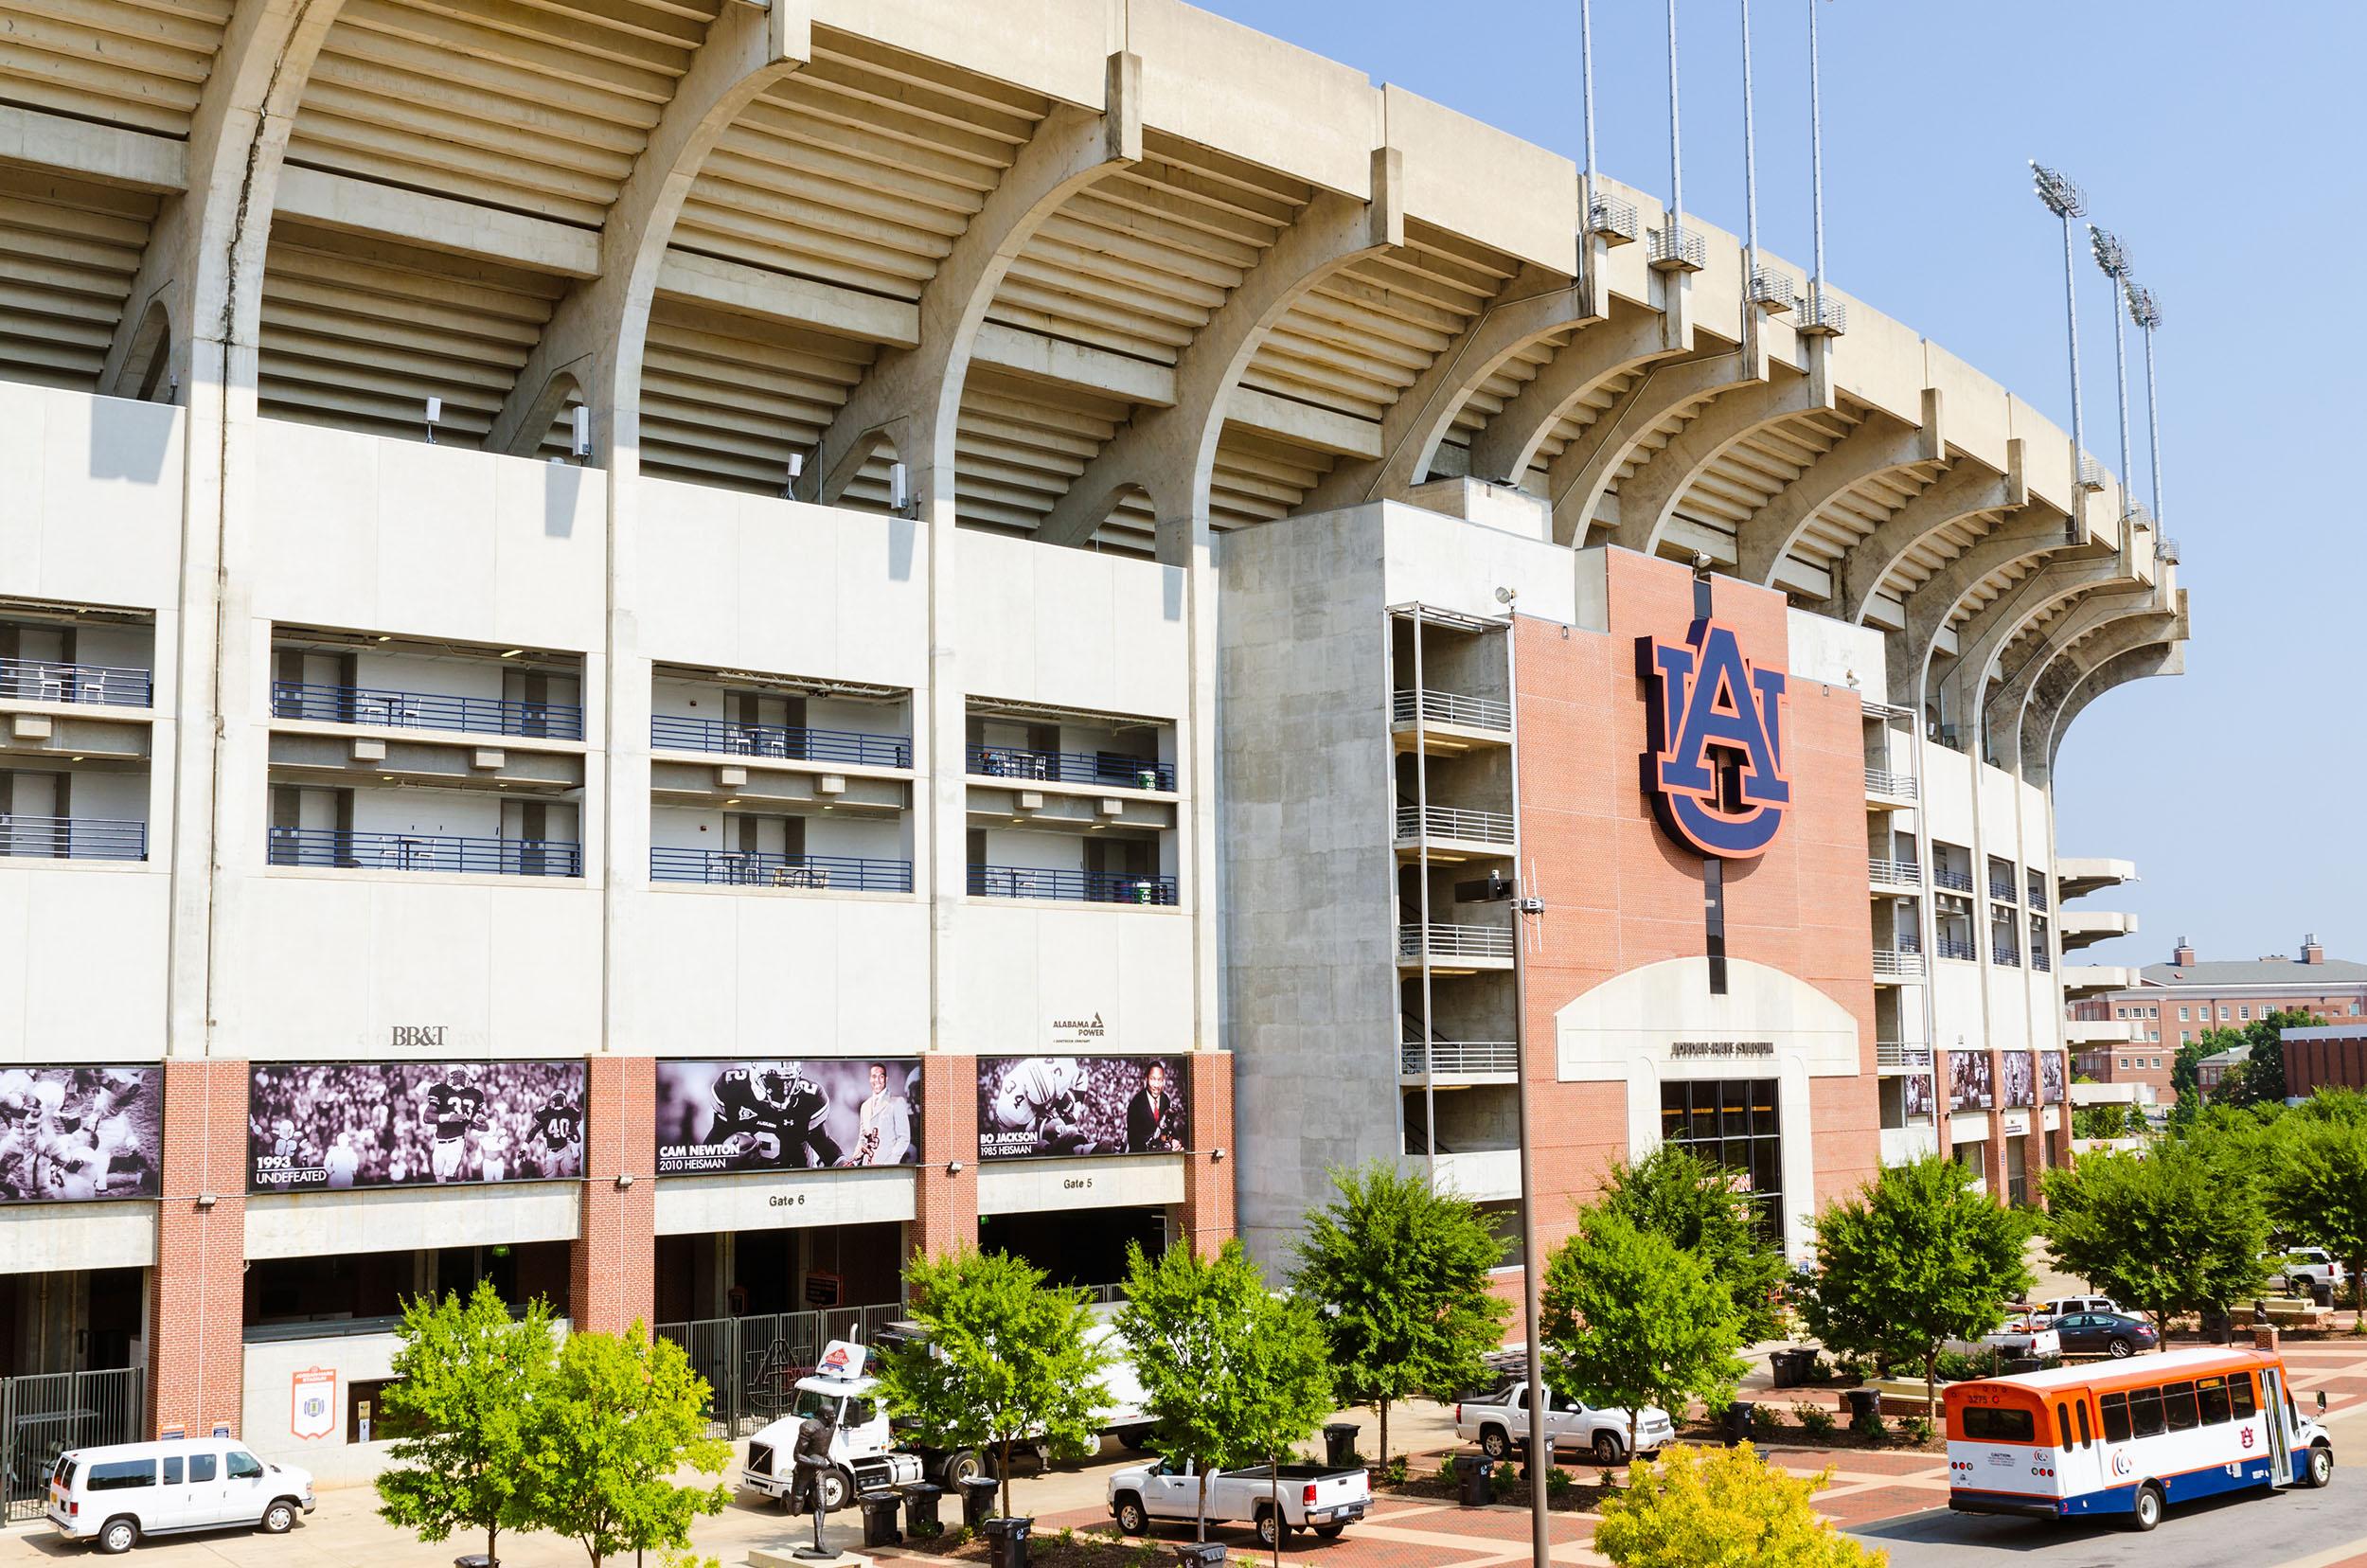 Facade of Jordan Hare stadium on the campus of Auburn University in Auburn, Alabama.